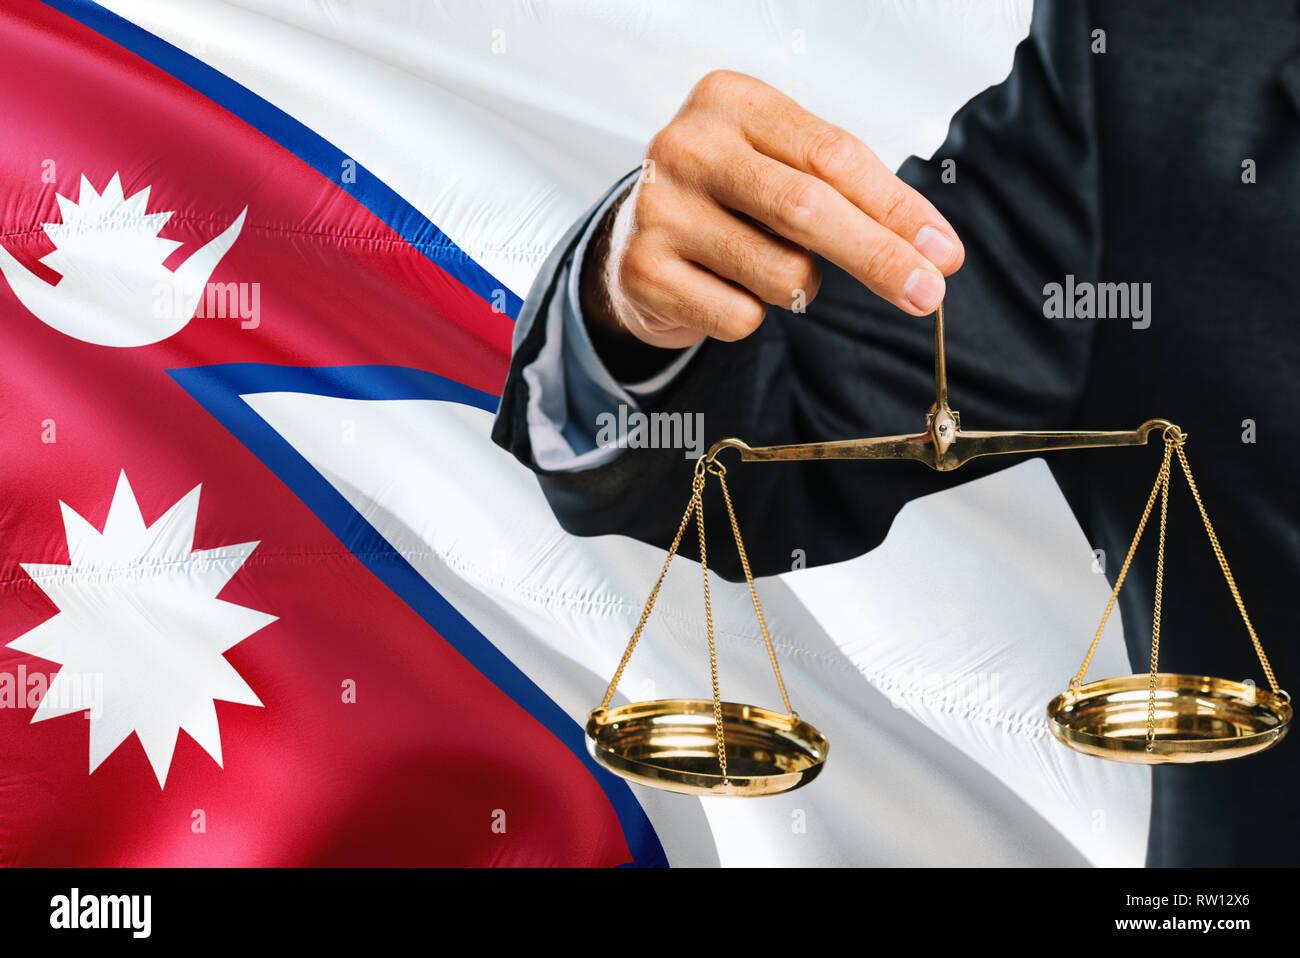 Nepal Waving Flag Stock Photos & Nepal Waving Flag Stock